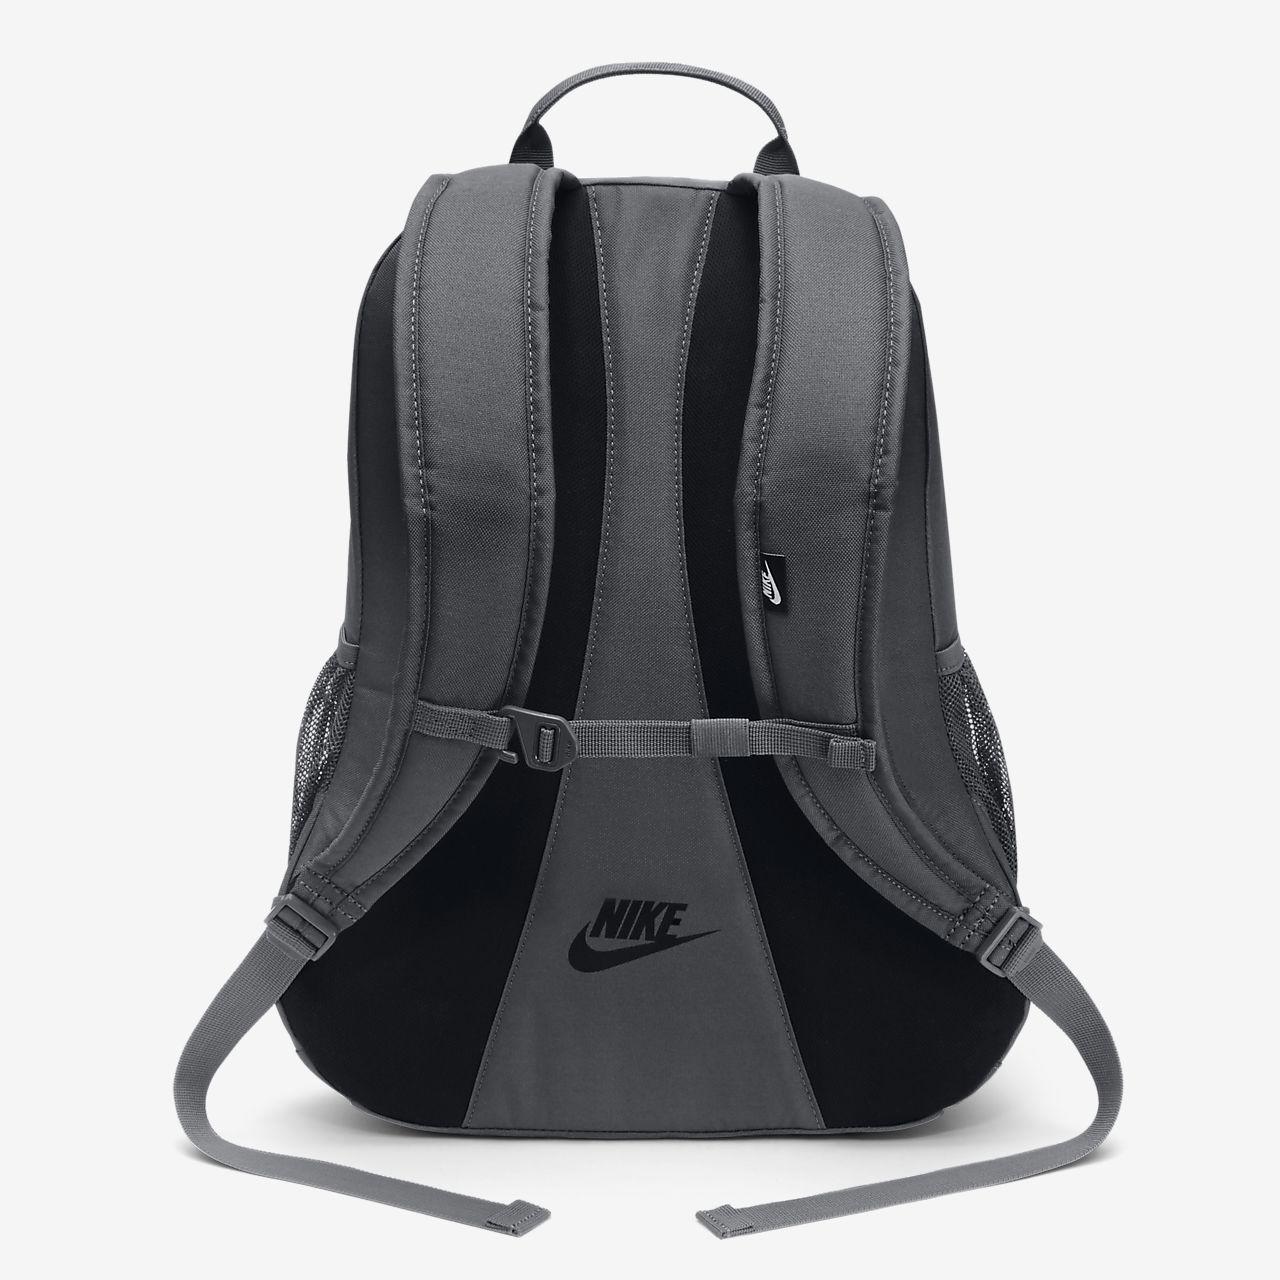 9467047149 Nike Sportswear Hayward Futura 2.0 Backpack. Nike.com ZA